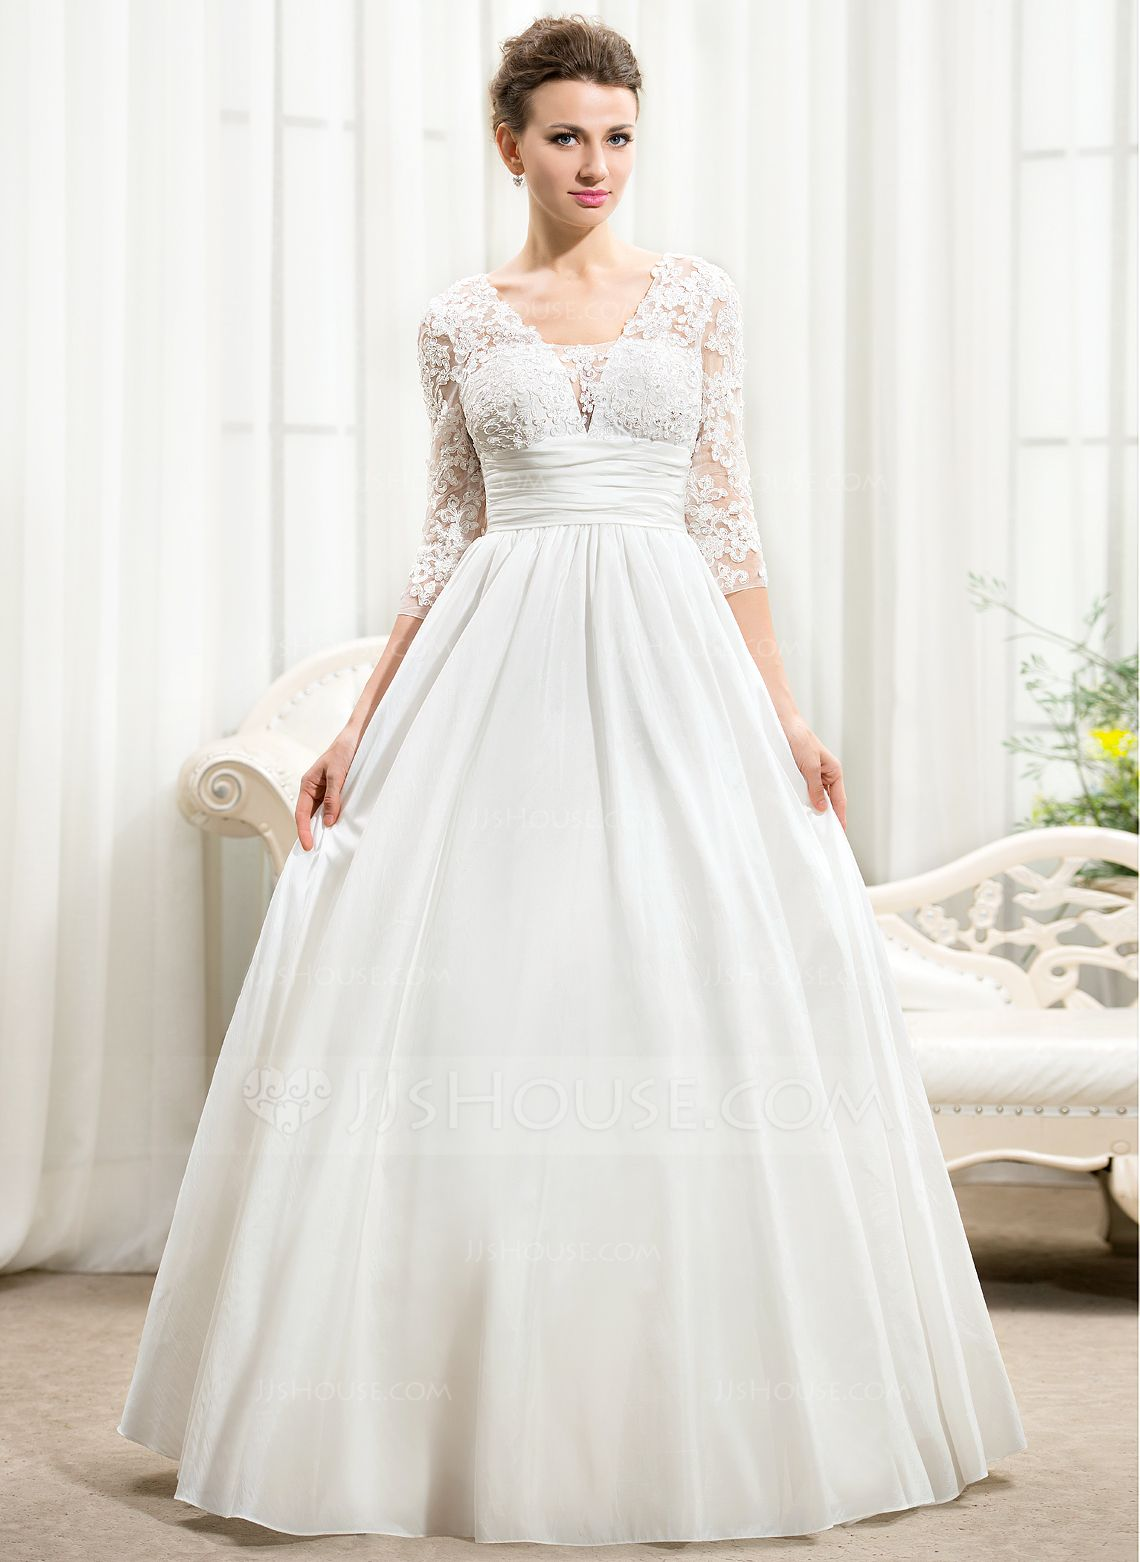 Us 241 00 Ball Gown V Neck Floor Length Taffeta Wedding Dress With Ruffle Beading Sequins Jj S House Wedding Dresses Taffeta Empire Waist Wedding Dress Cheap Wedding Dress [ 1562 x 1140 Pixel ]